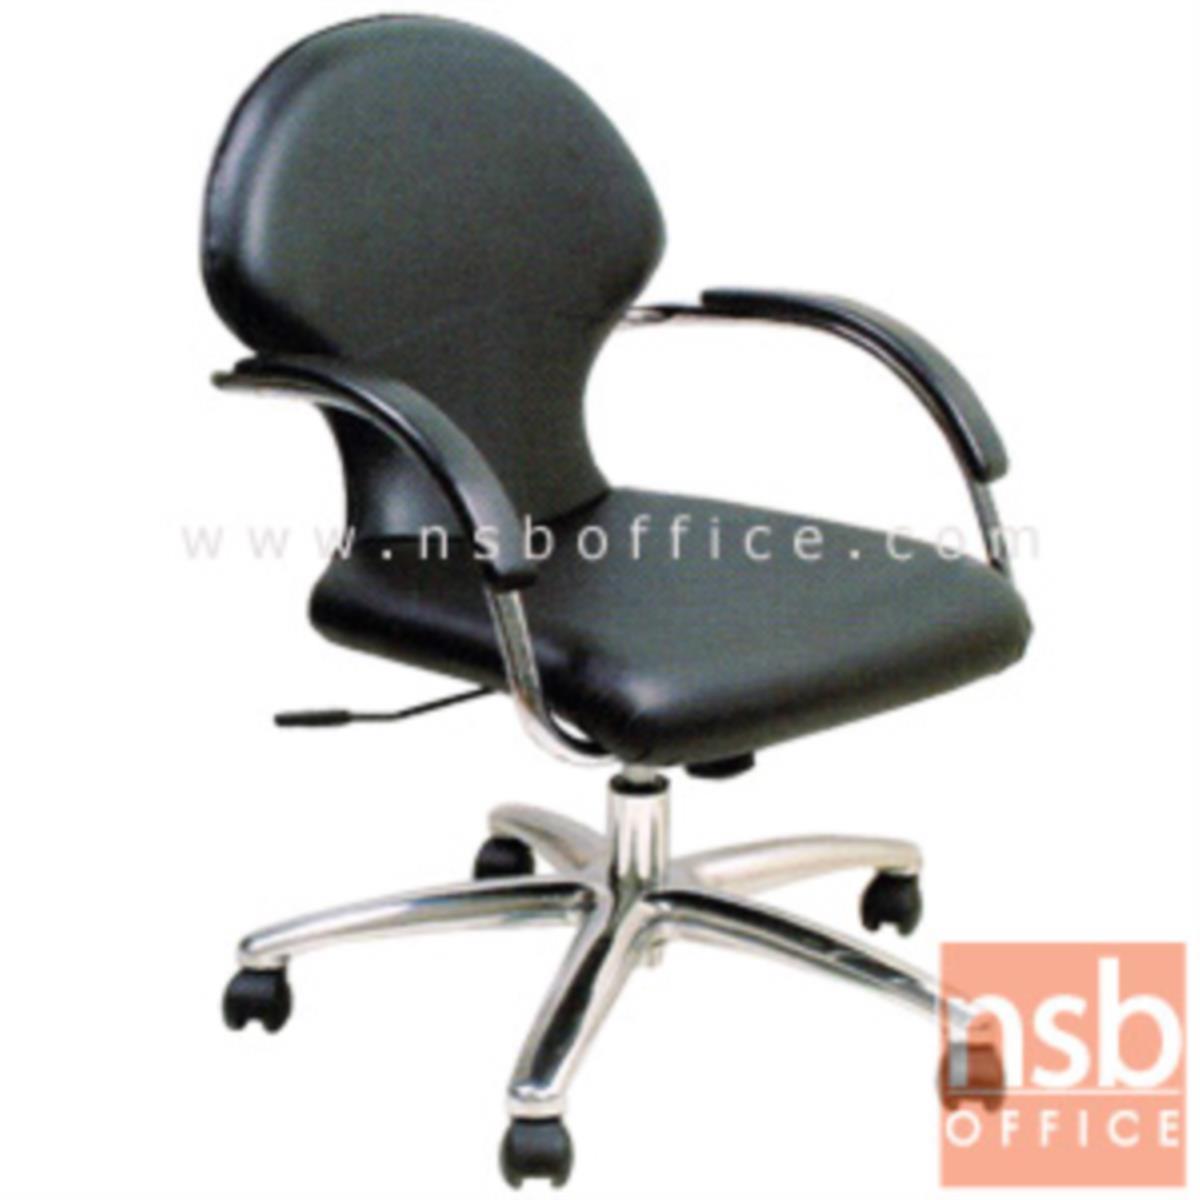 B03A225:เก้าอี้สำนักงาน รุ่น Lipmann (ลิพมัน)  โช๊คแก๊ส มีก้อนโยก ขาเหล็กชุบโครเมี่ยม